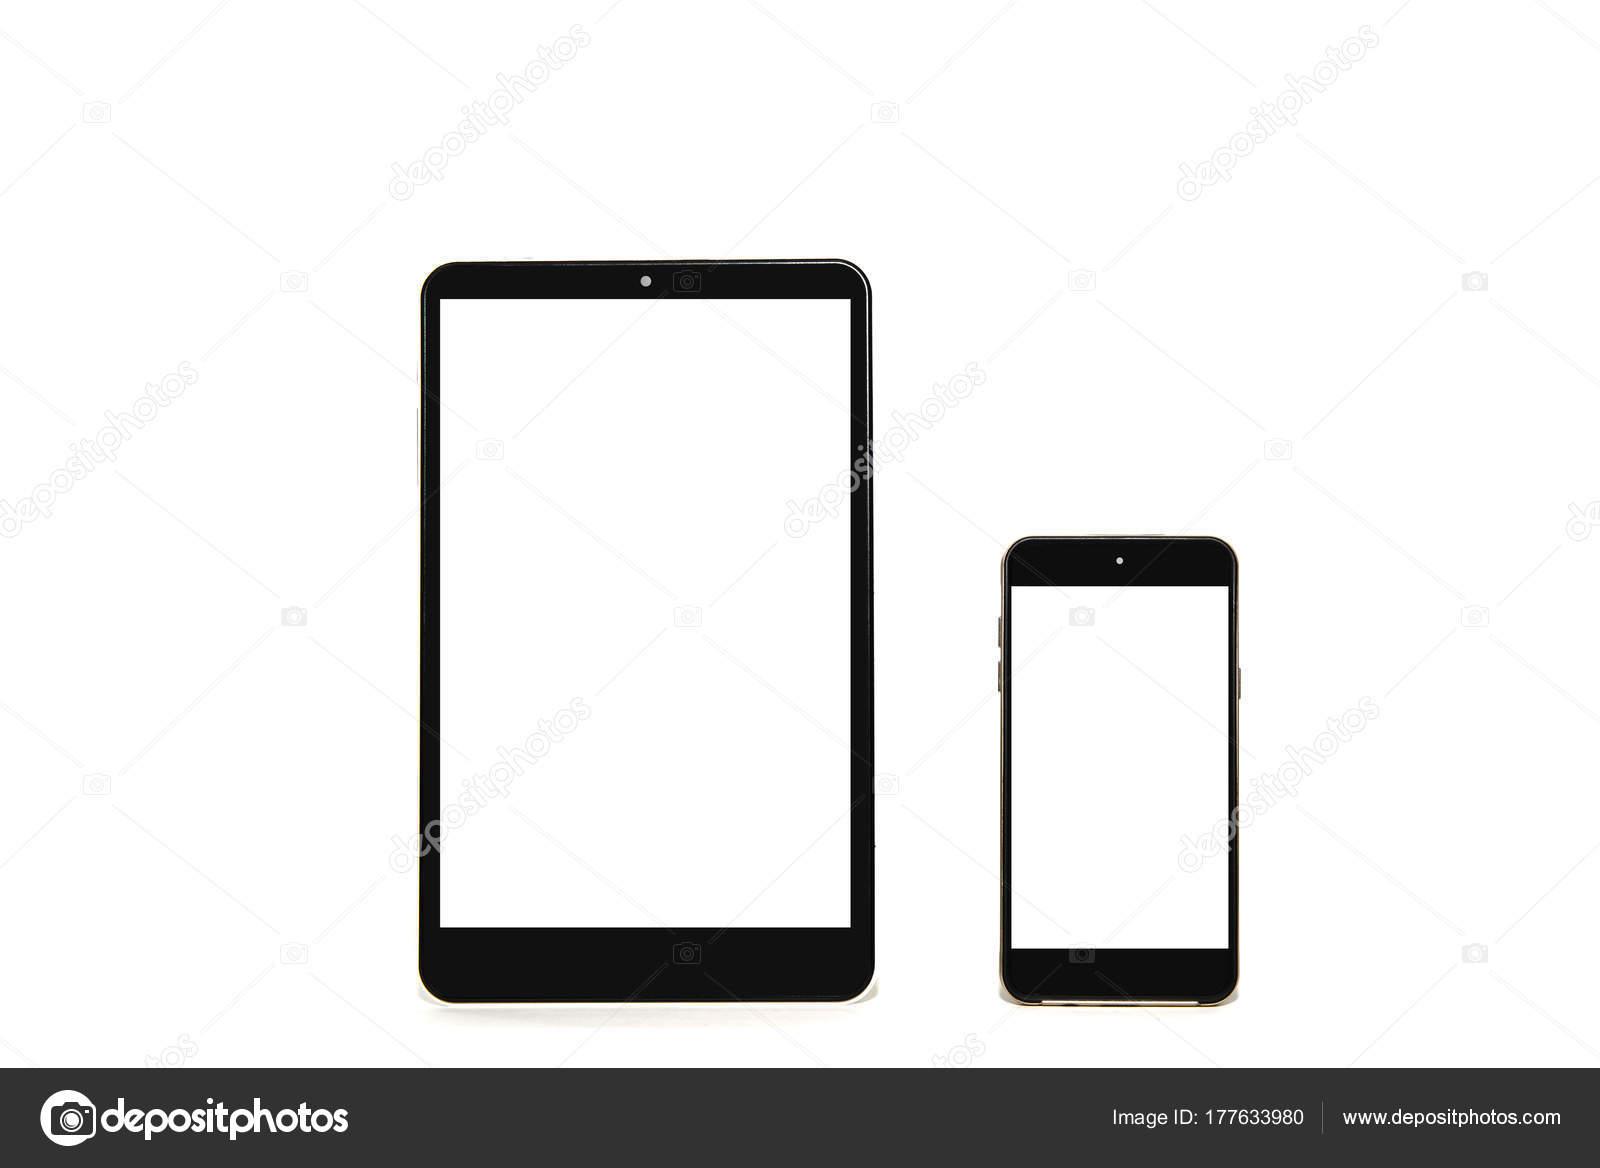 Tablet Telefono Isolato Sfondo Bianco Vuoto Bianco Display Integrare